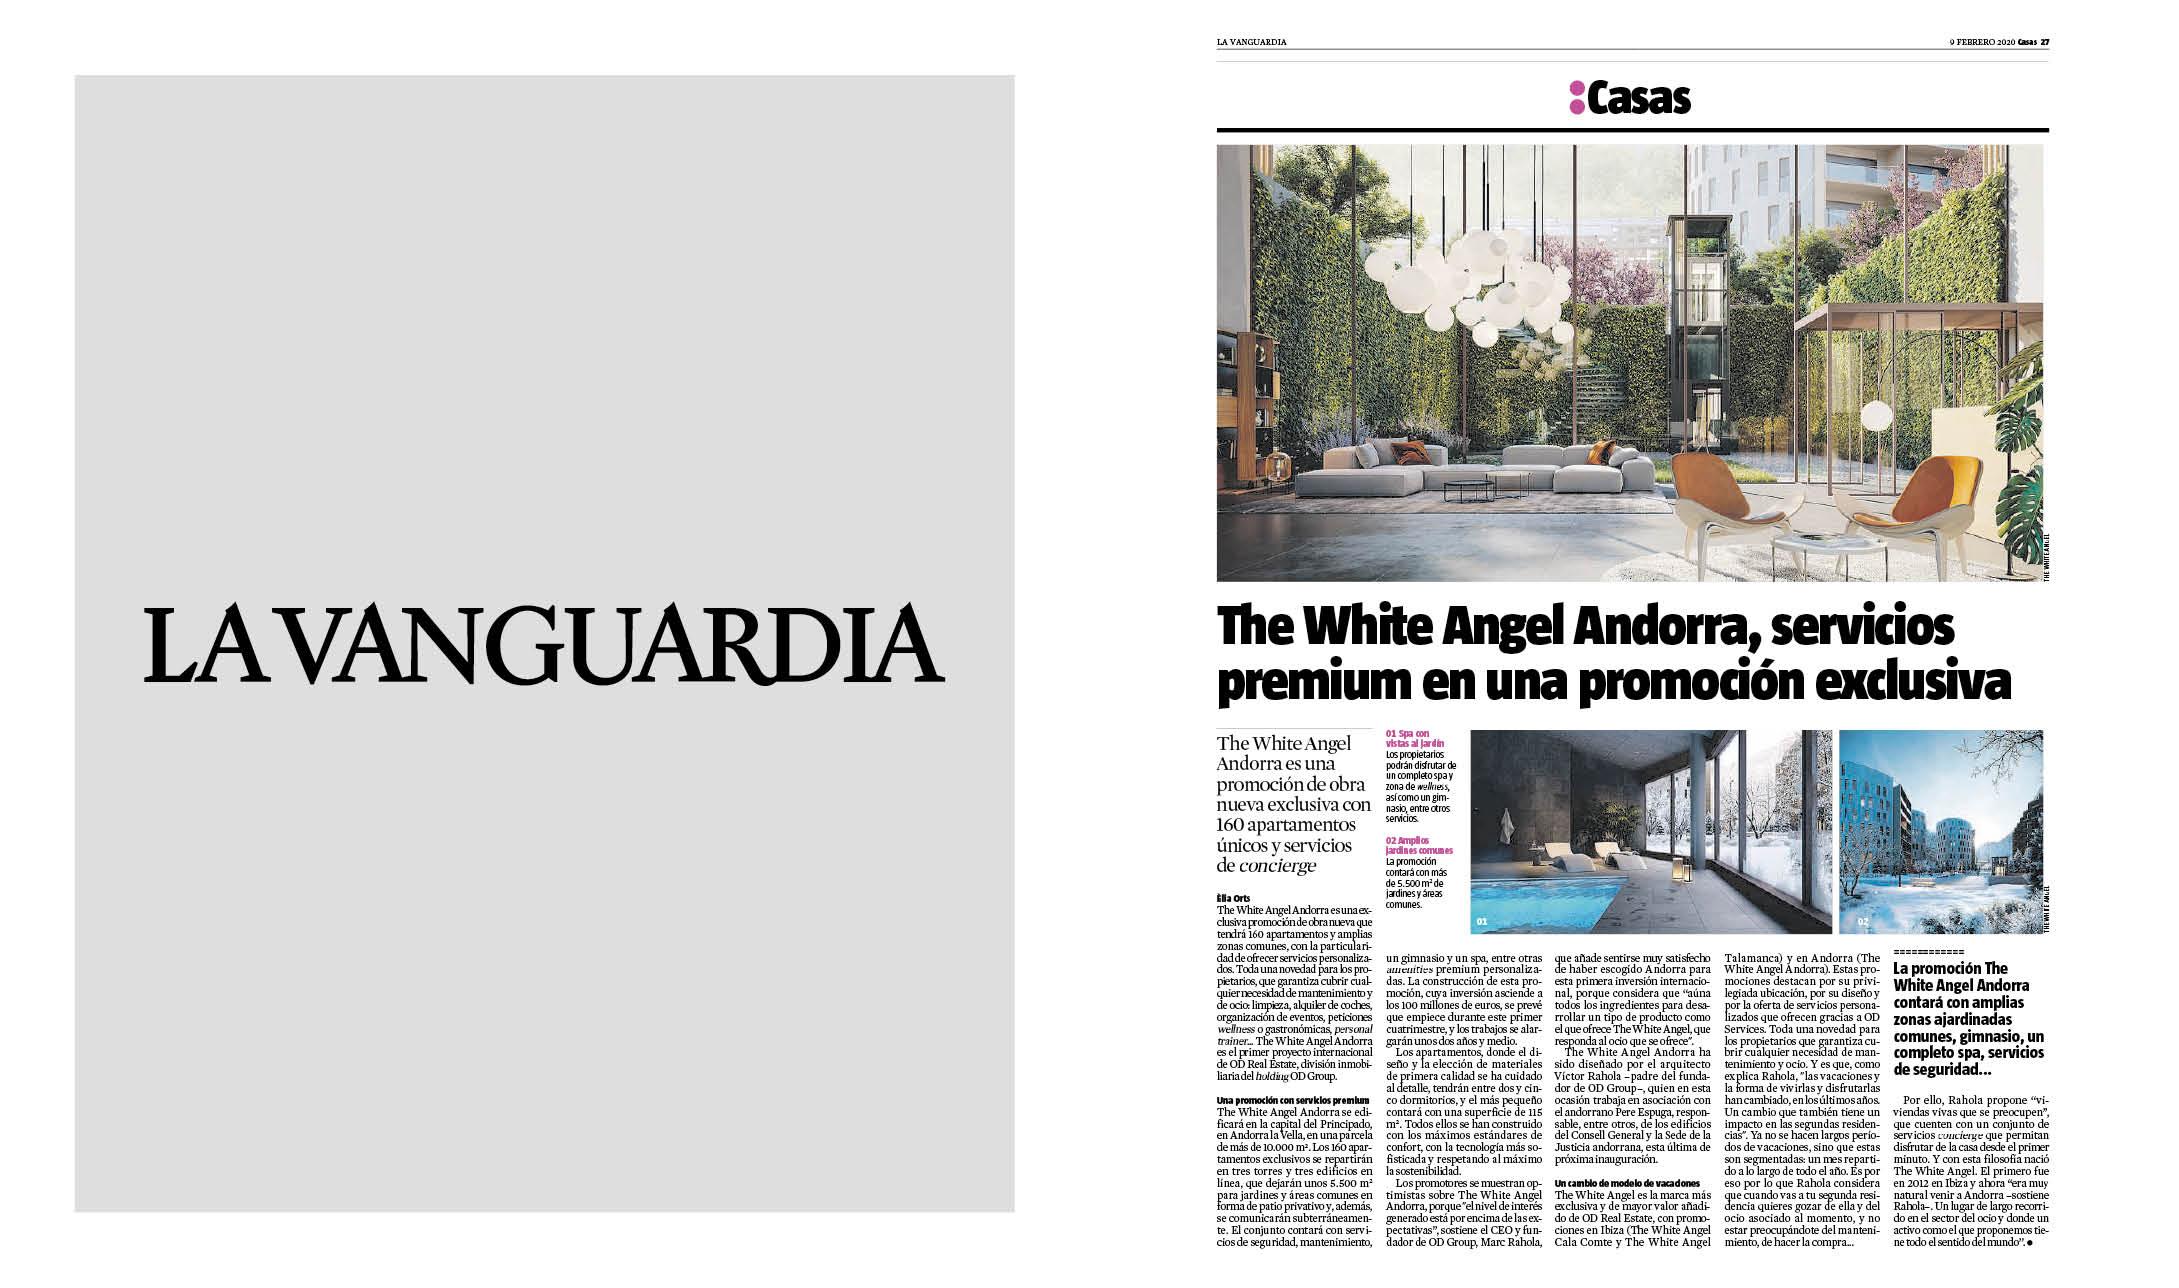 26.WEB_PRENSA26_LA VANGUARDIA_THEWHITEANGEL